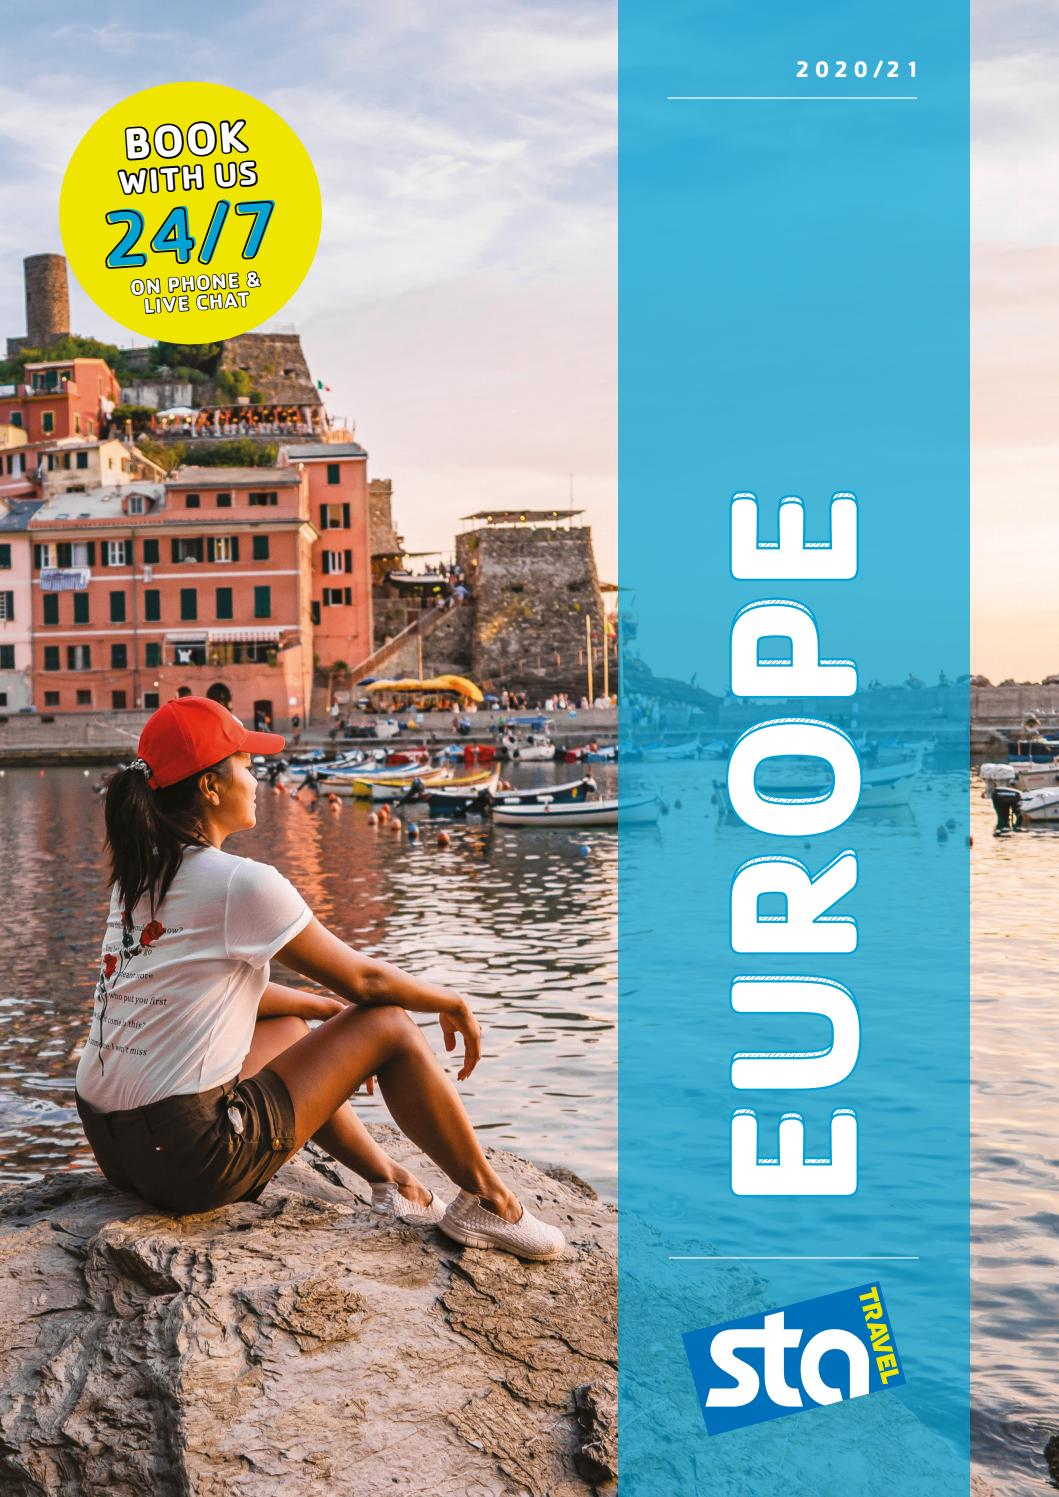 ORG VTG CATANIA SEA//Ocean~AZIENDA,ITALY~Summer Europe Art Poster Travel Tourism